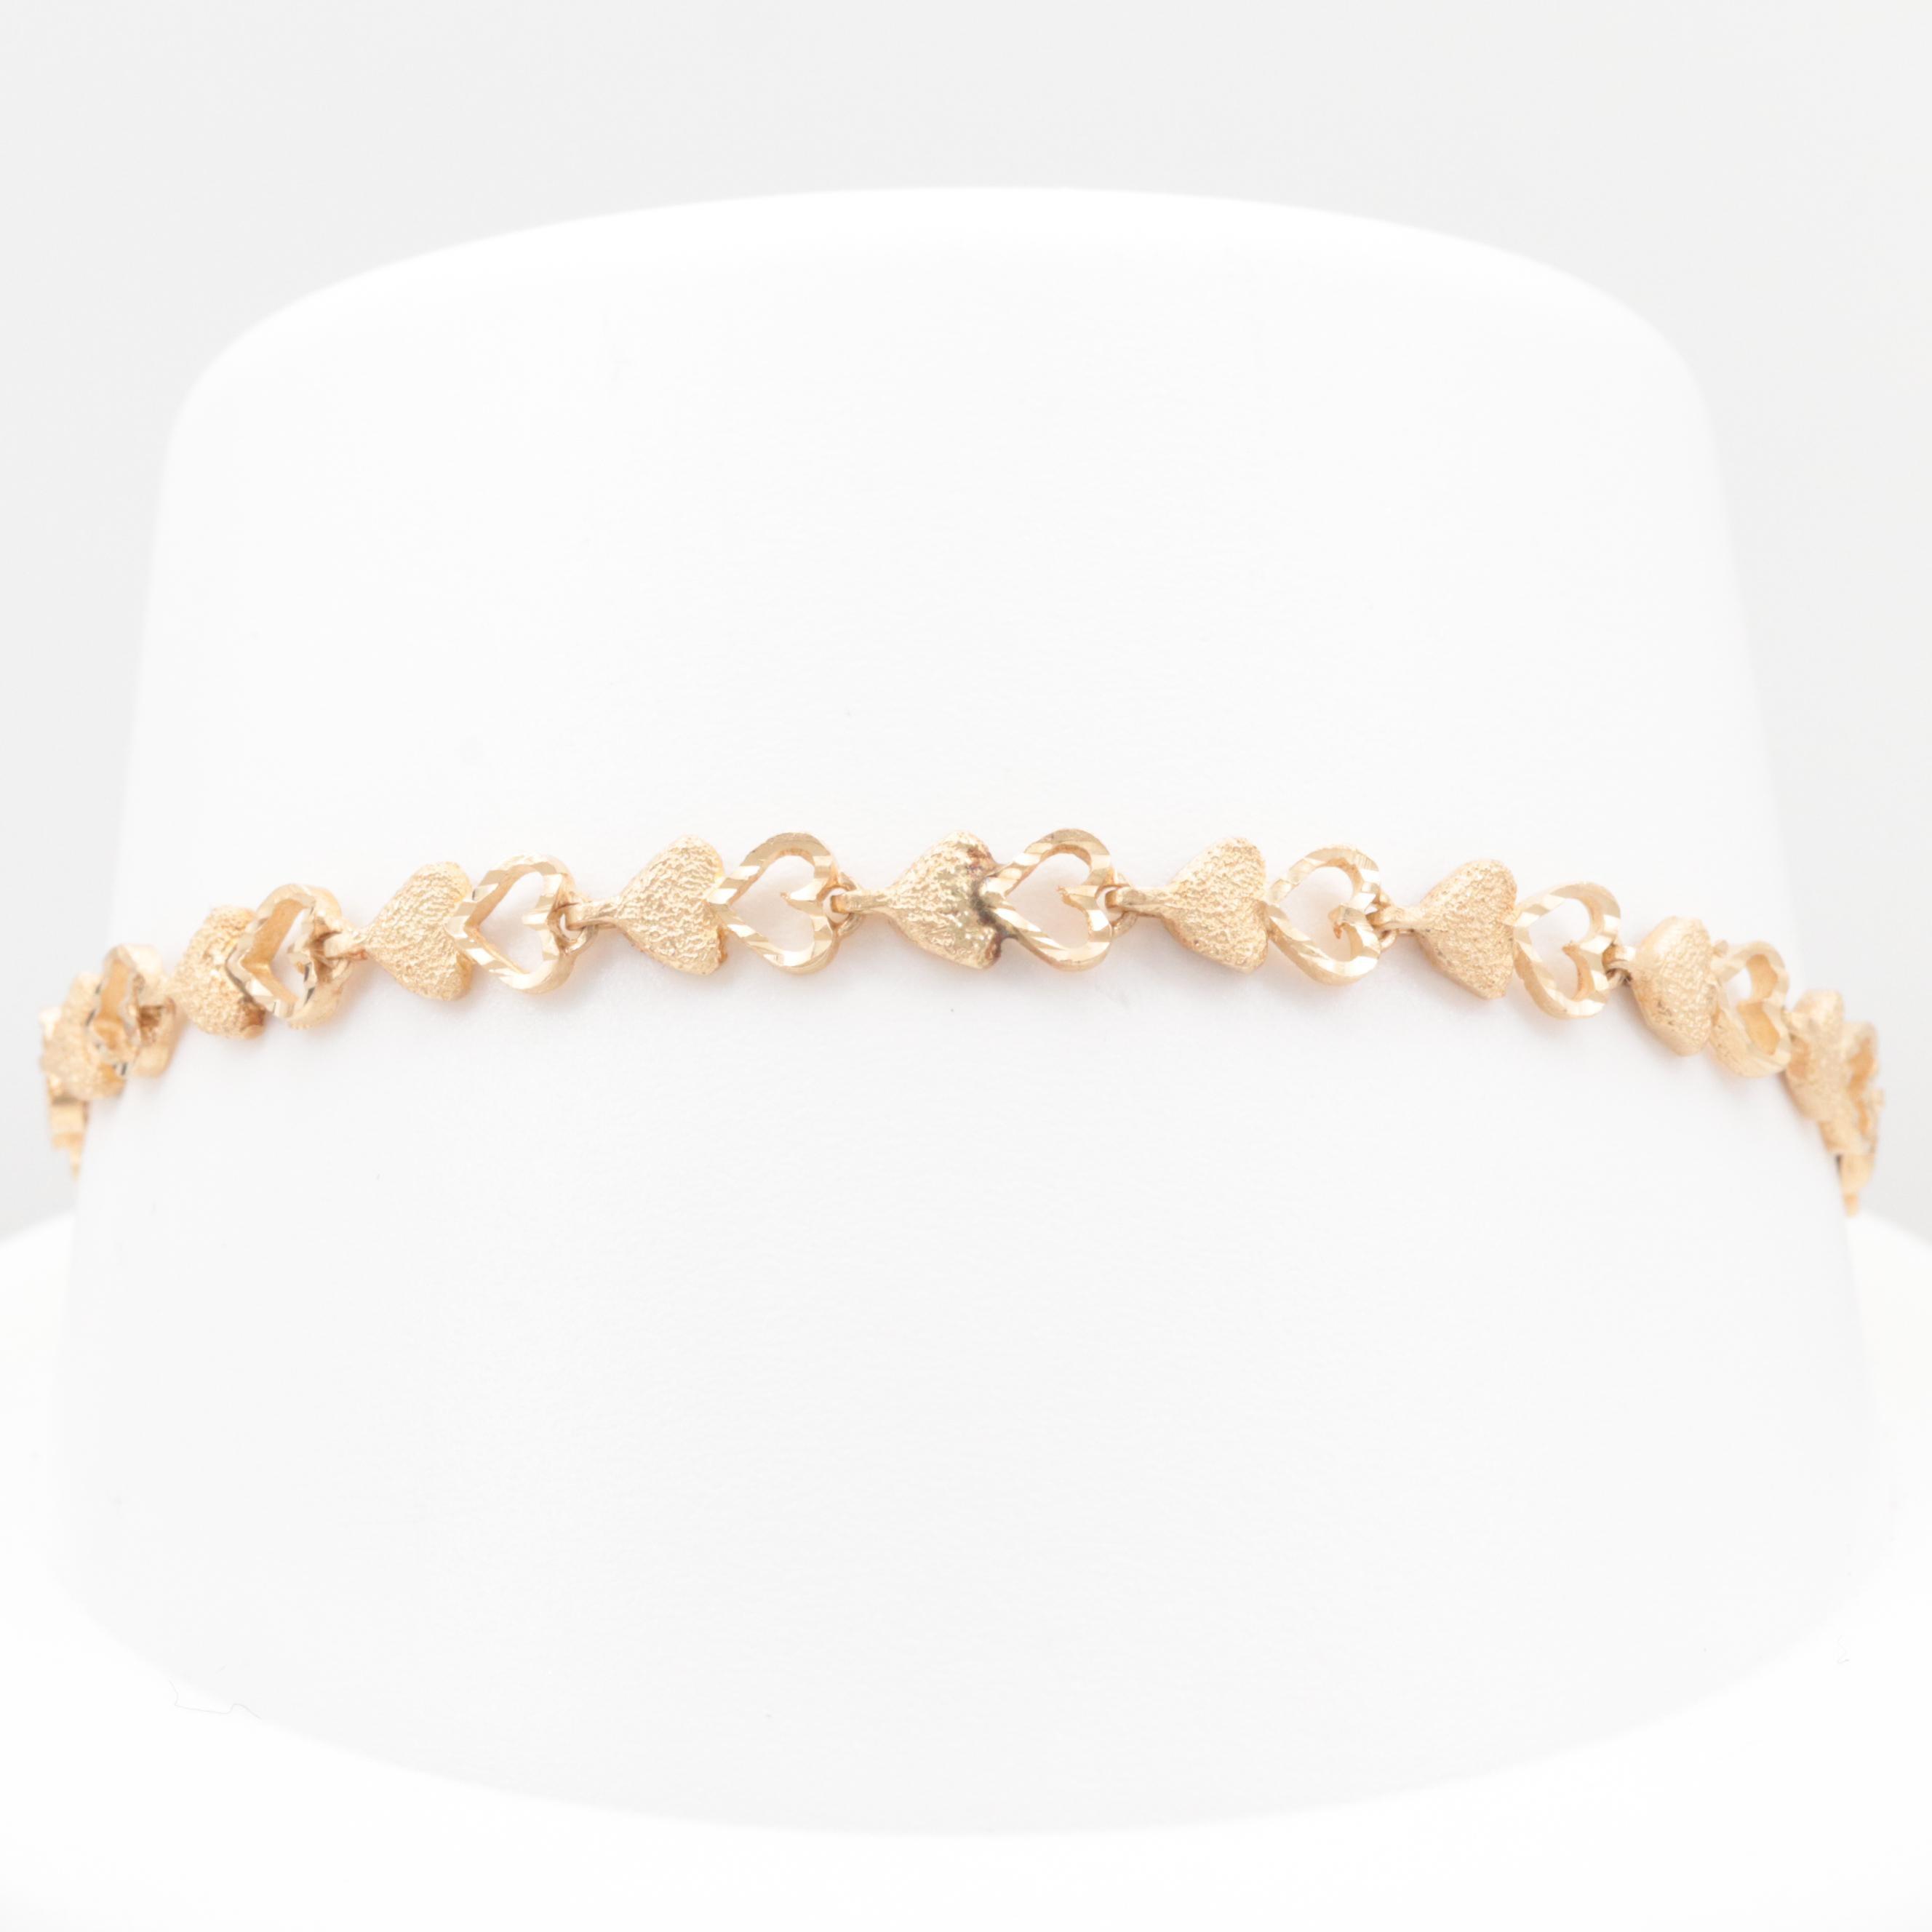 14K Yellow Gold Heart Link Bracelet